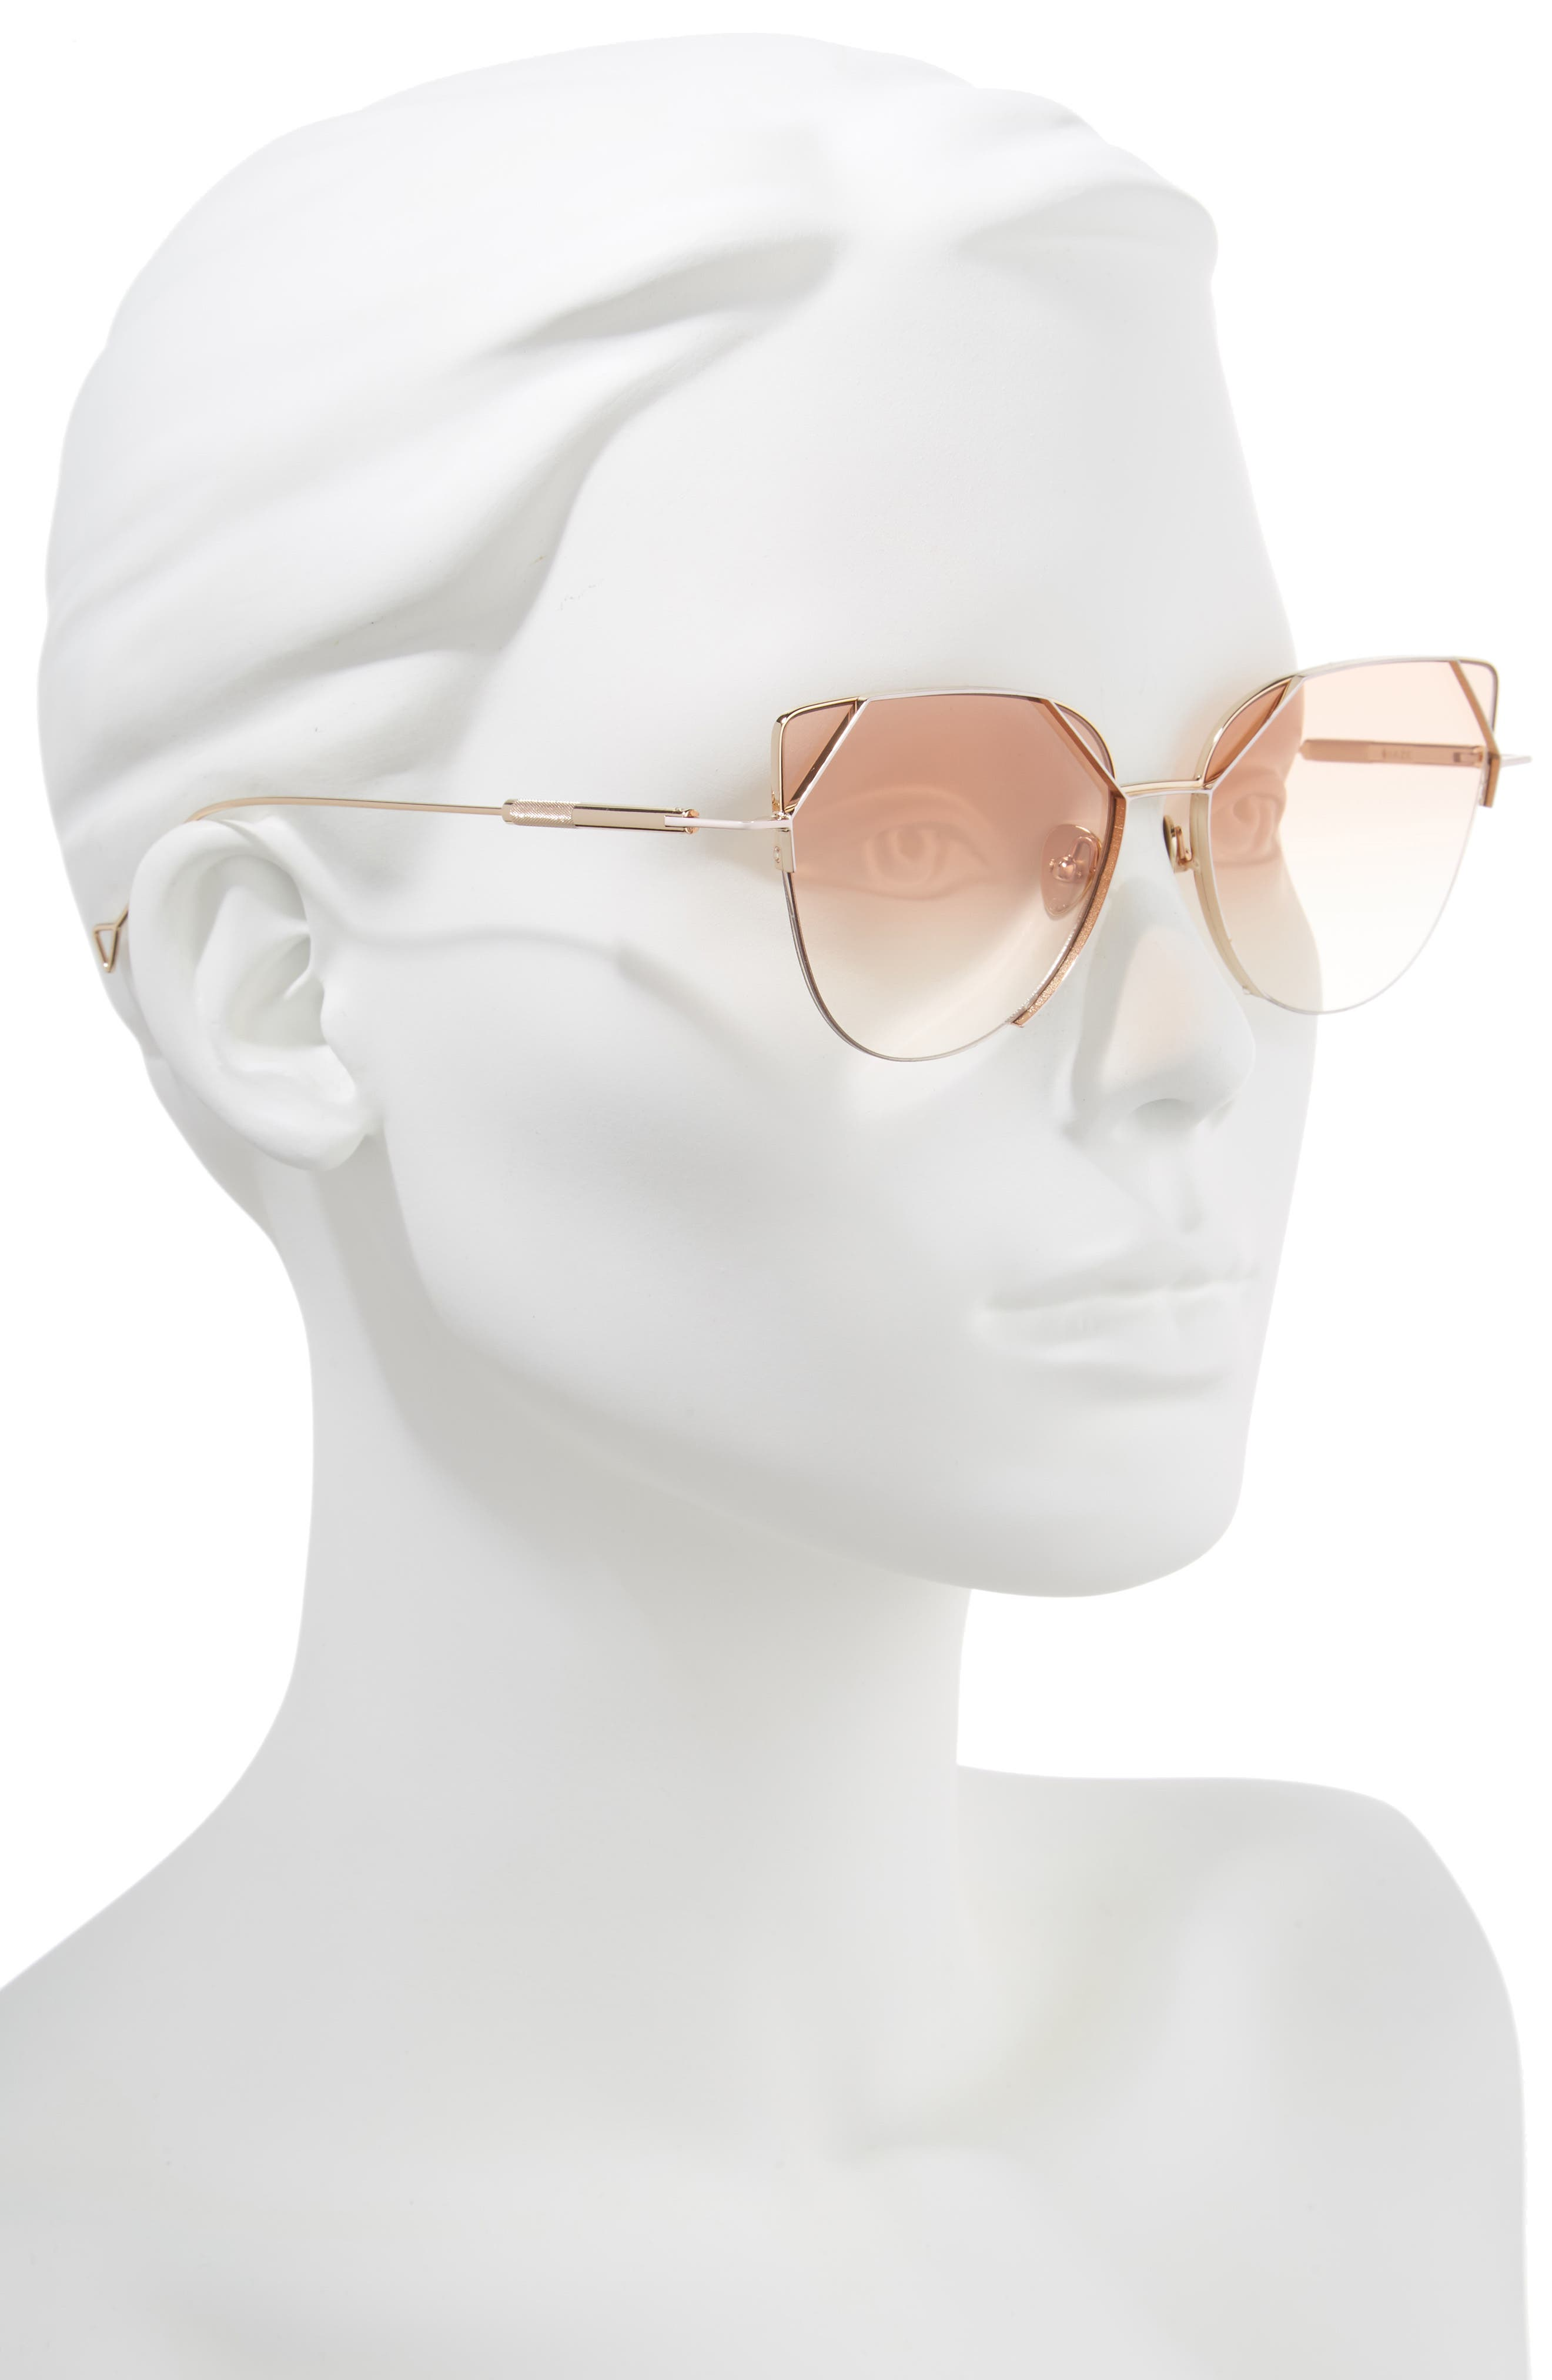 HAZE, The Schema 59mm Cat Eye Sunglasses, Alternate thumbnail 2, color, NUDE